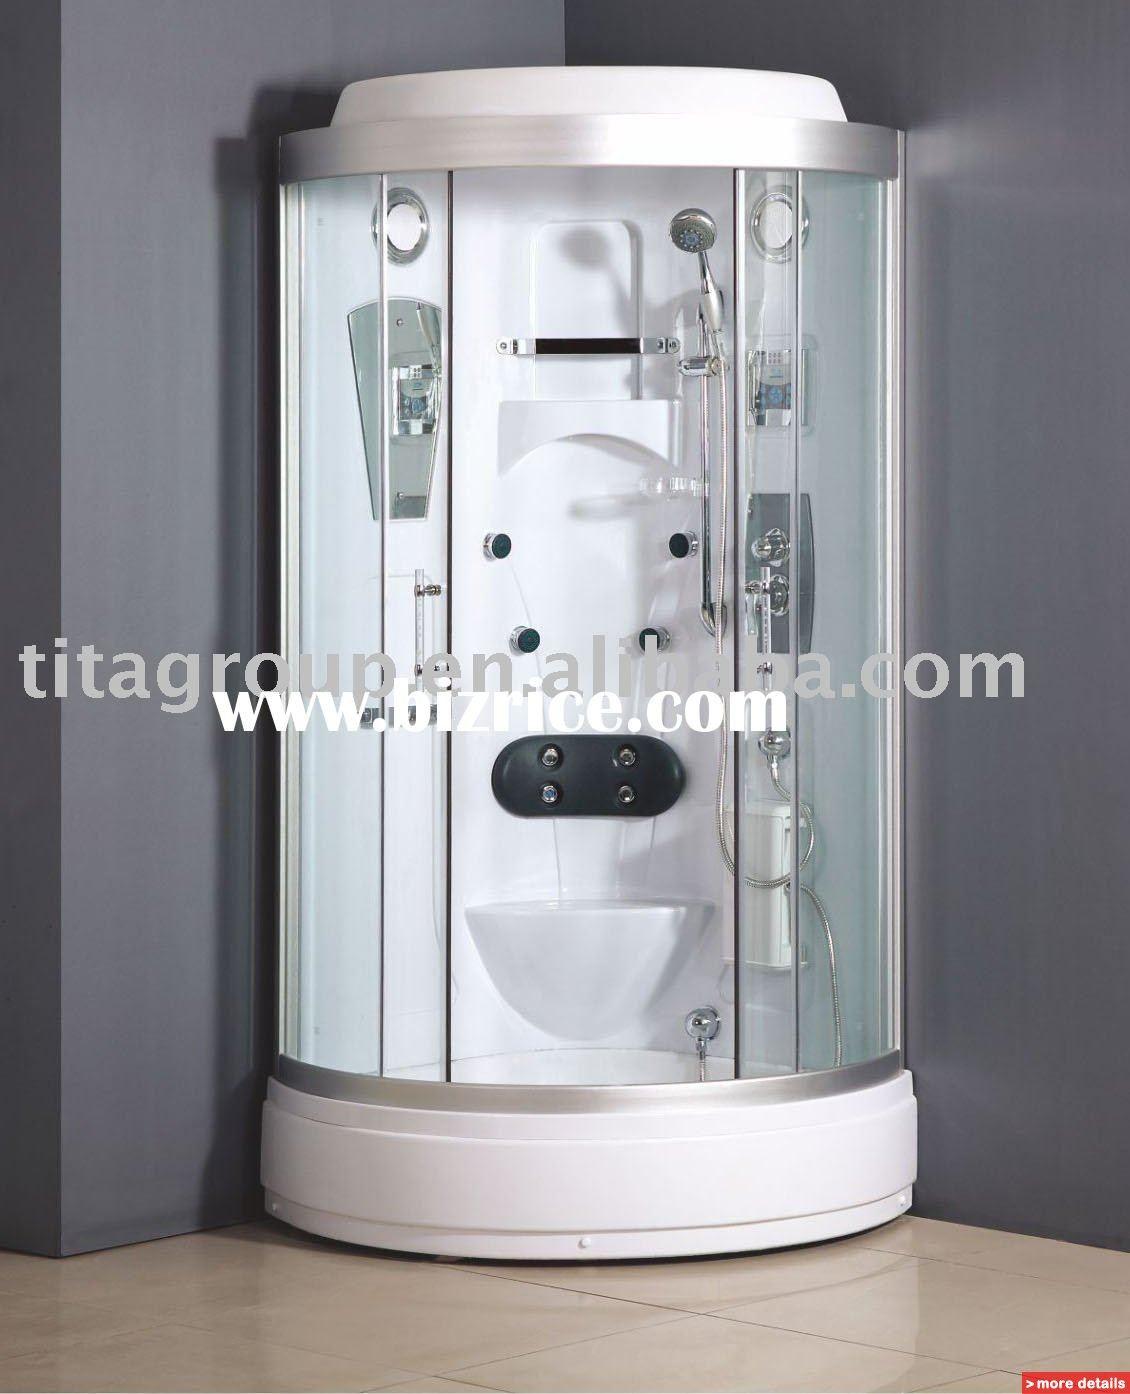 bathroom showers for sale | pinterdor | Pinterest | Bathroom designs